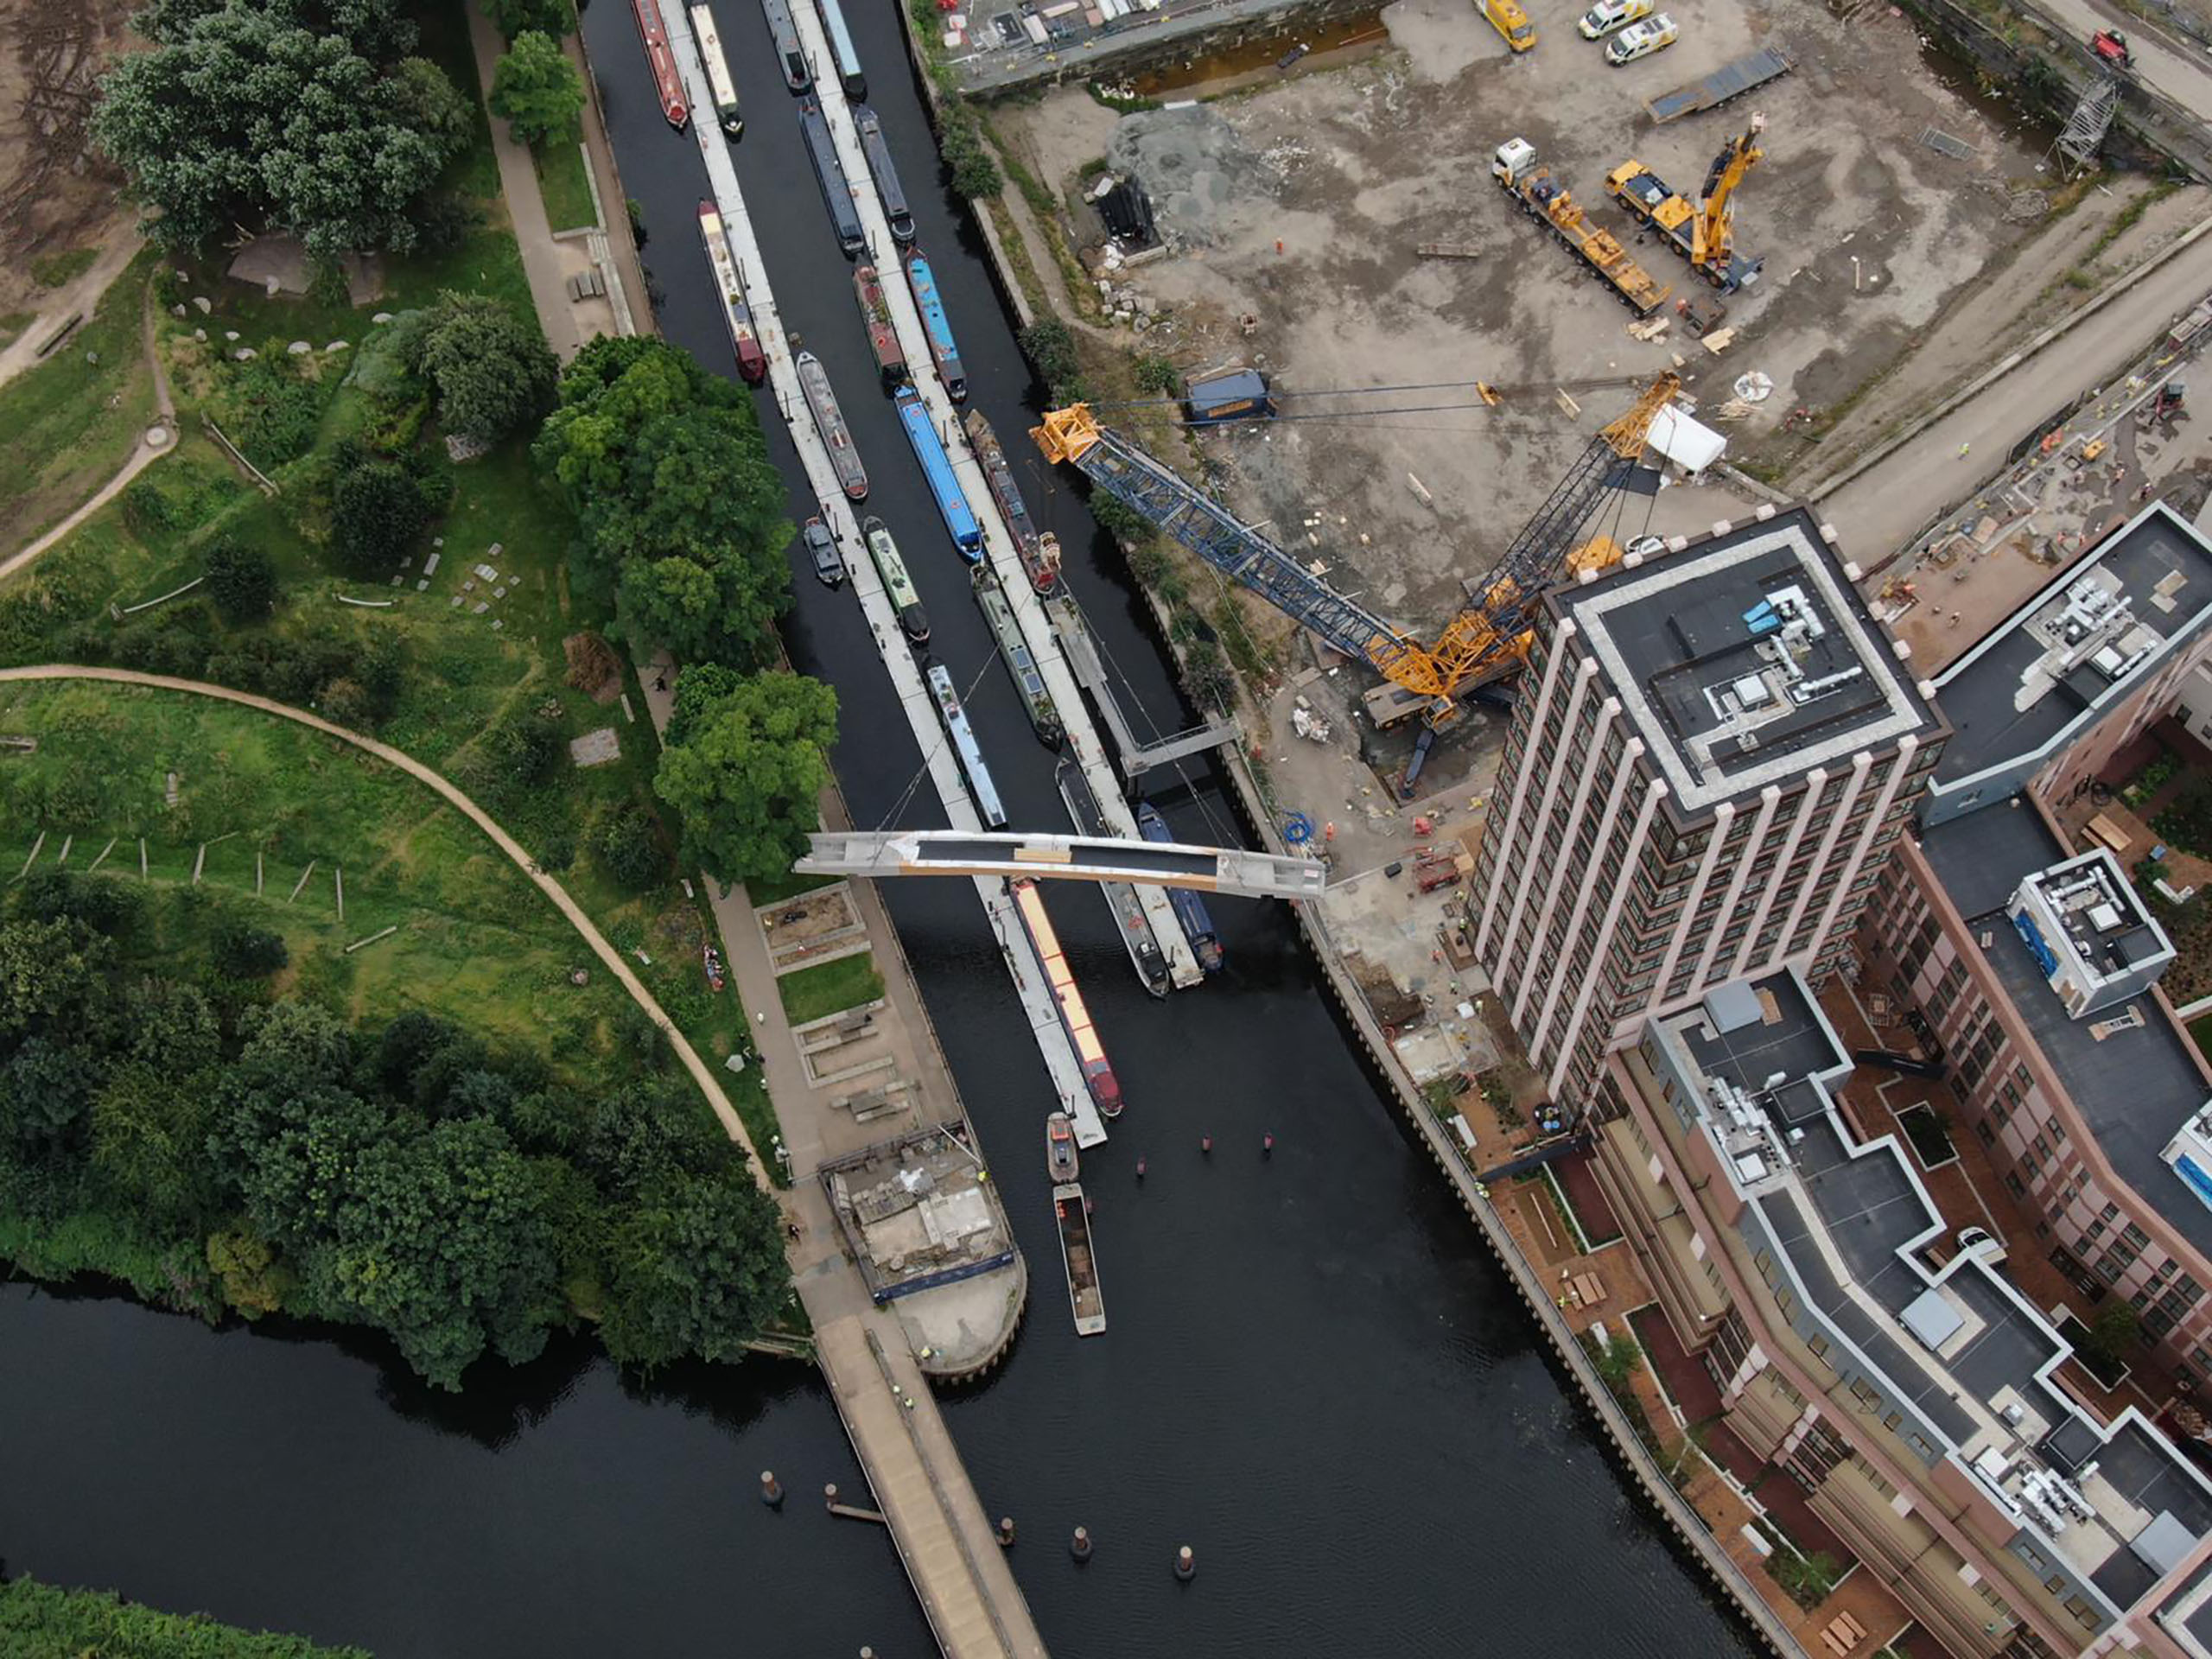 Bridge install by crane